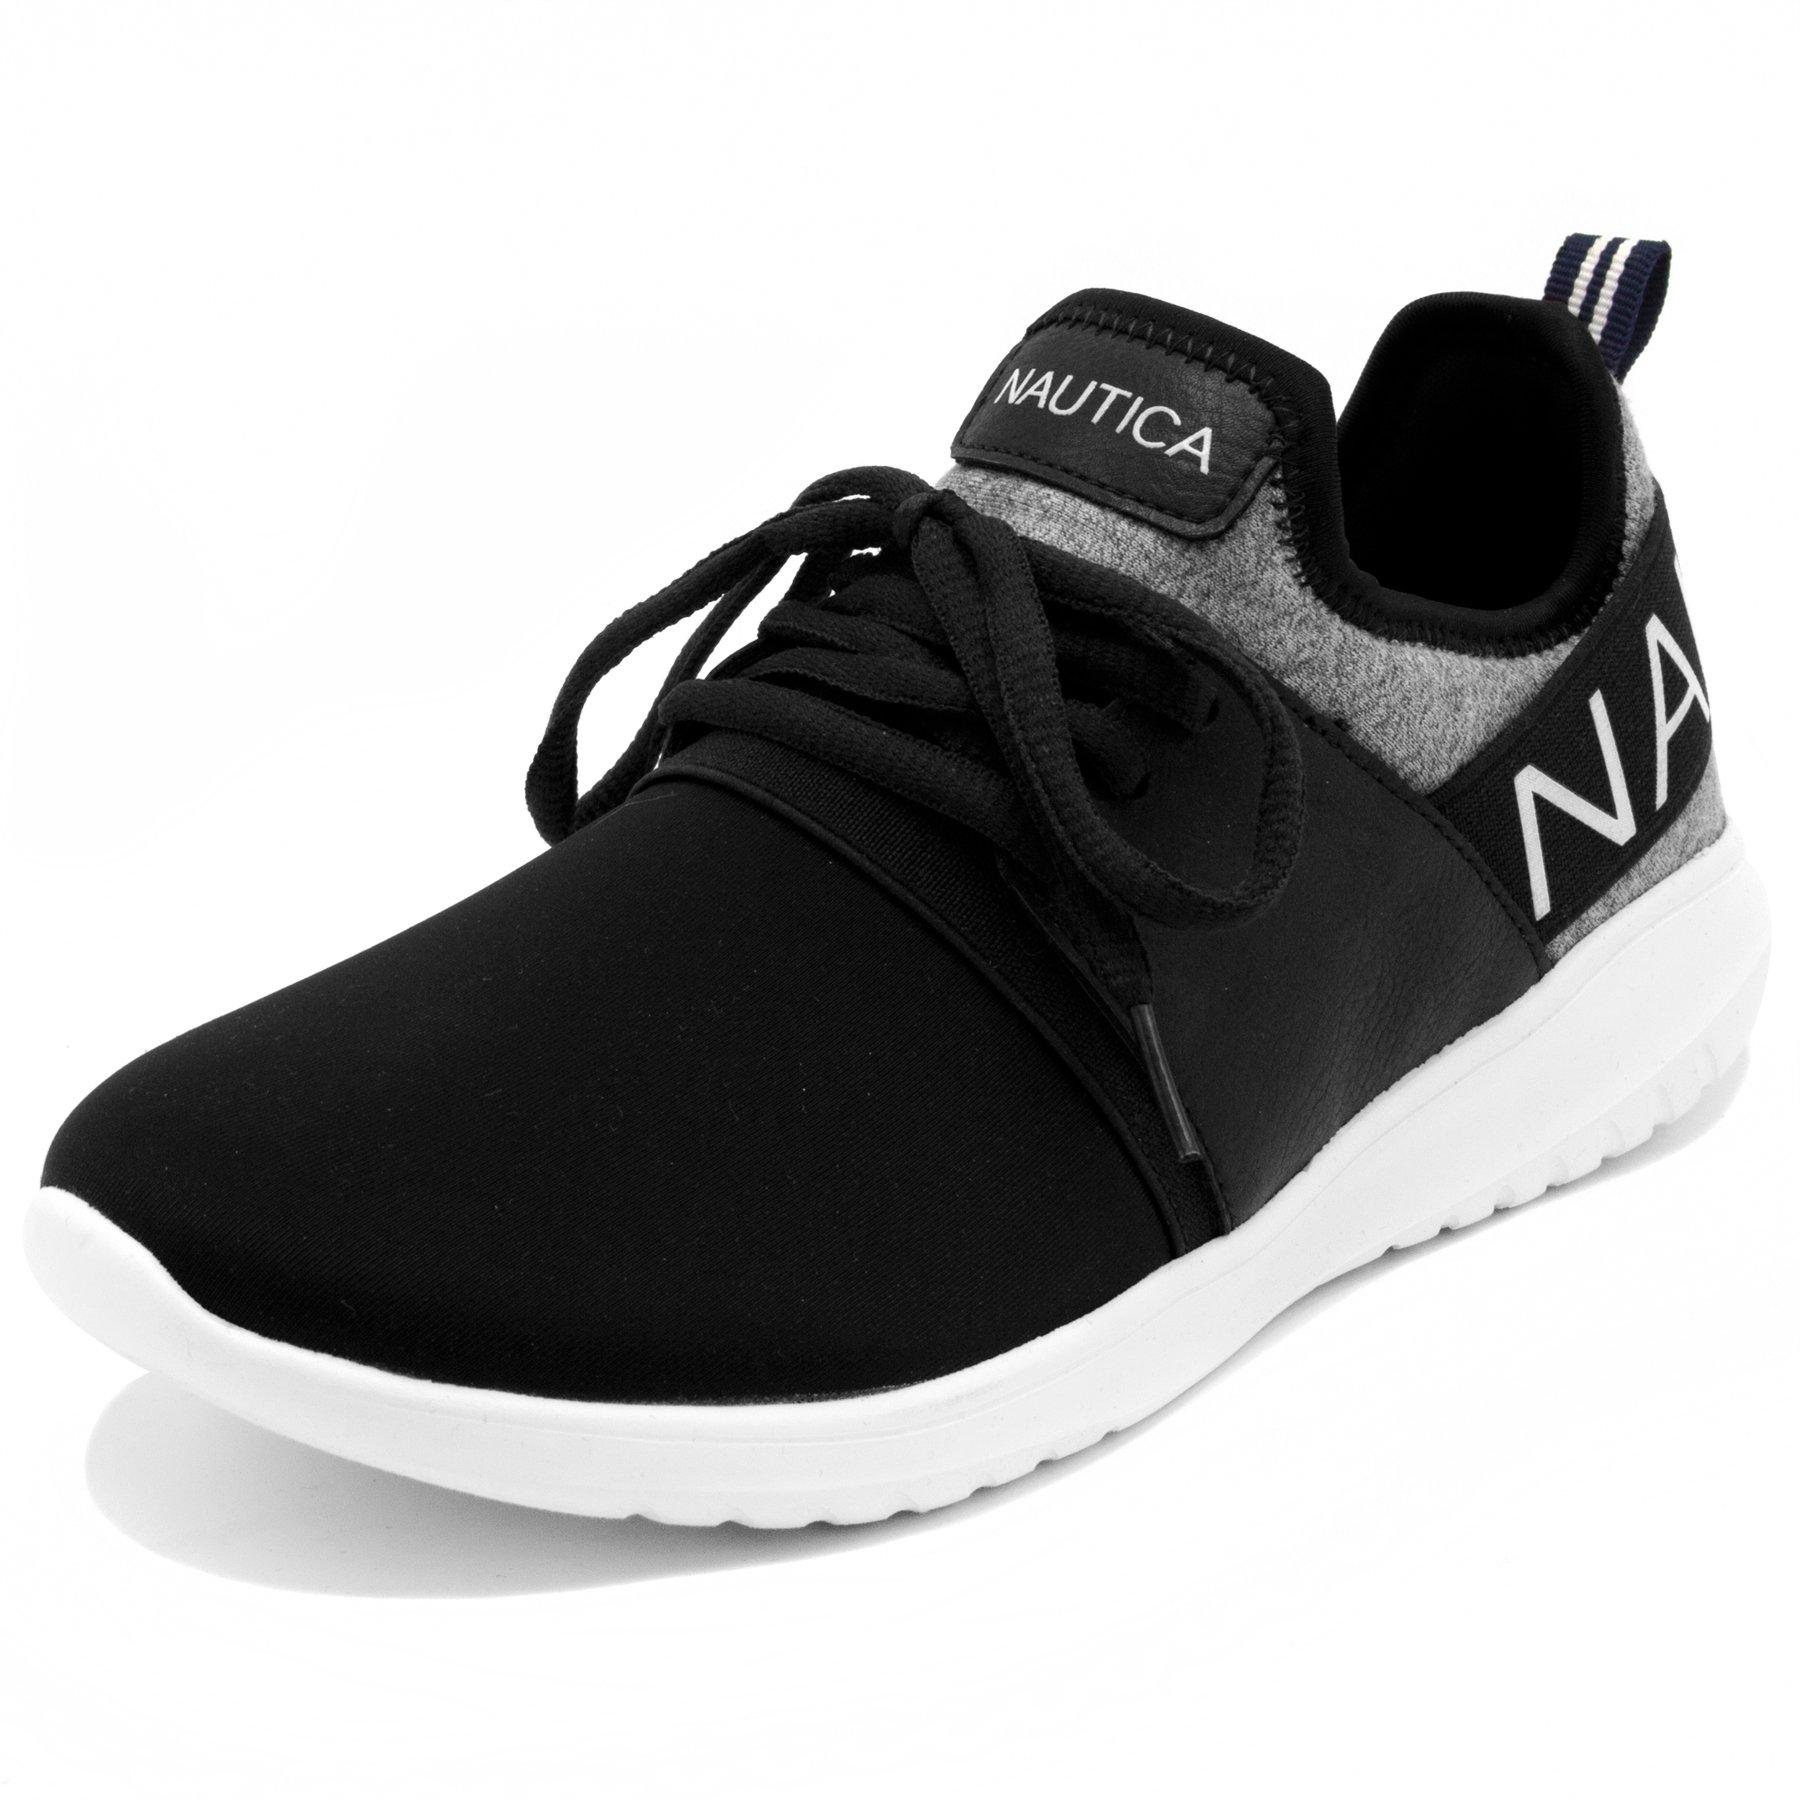 Nautica Women Fashion Jogger Sneaker-Black Heathered-7.5 by Nautica